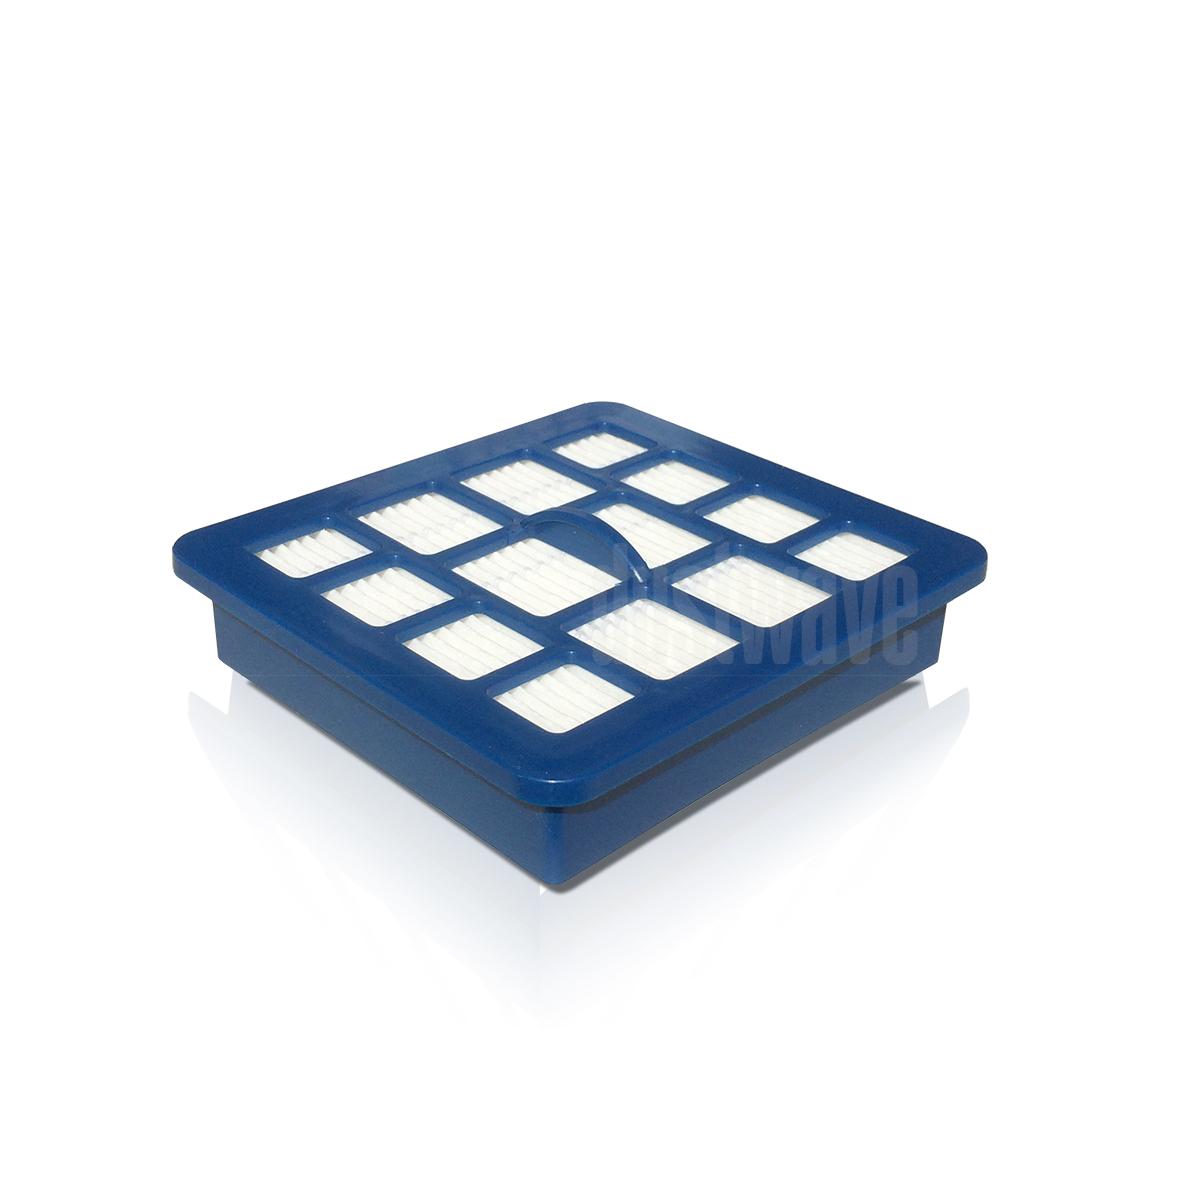 TE70-TE65011 TTE-2410-011-TeliosPlus u.v.a. HEPA-Filter geeignet für Hoover